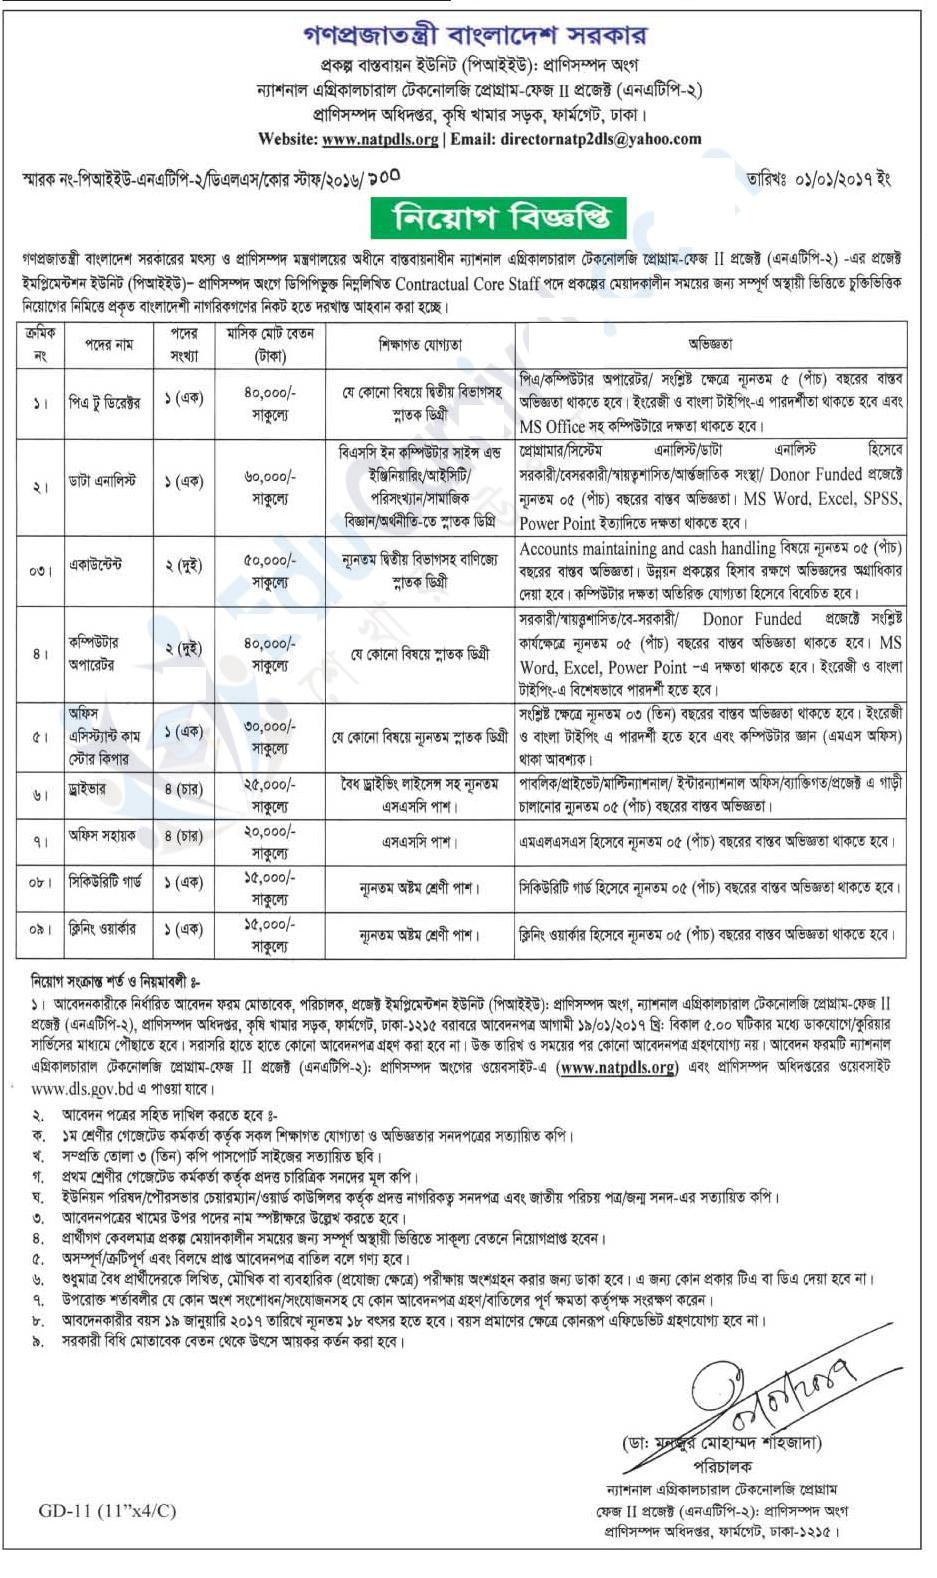 Bangladesh Livestock Services Department Job Circular 2017